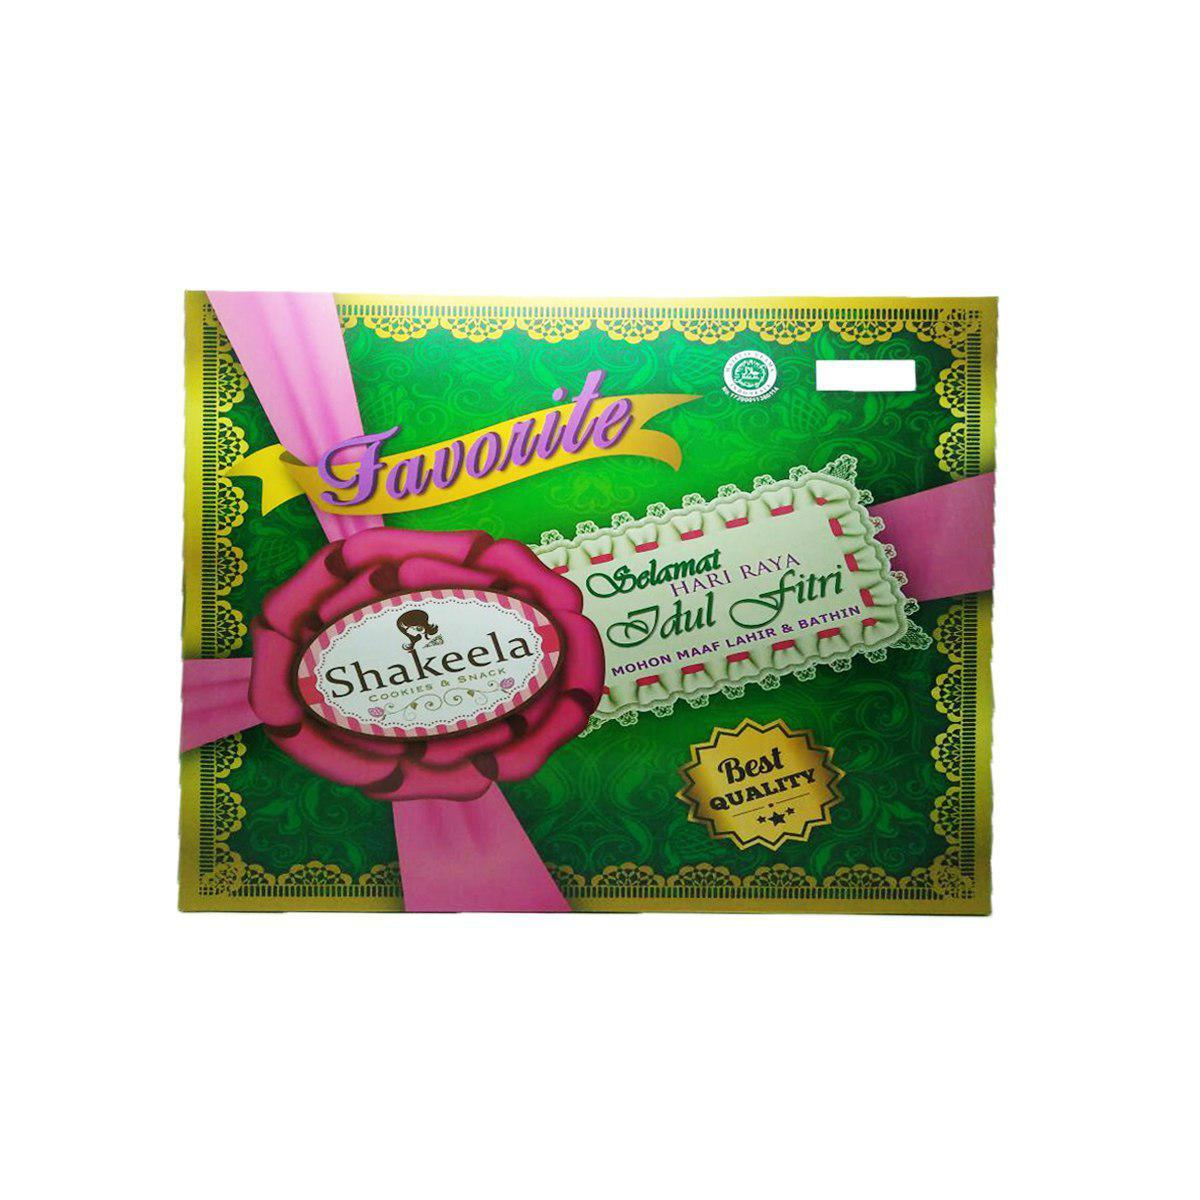 Paket Parcel Kue Lebaran Bellarosa Deluxe Hijau Daftar Harga 6in1 Berkah Platinum Kering Belarosa Cemilan Idul Fitri Gambar Produk Rinci Shakeela Favorite Halal Terkini